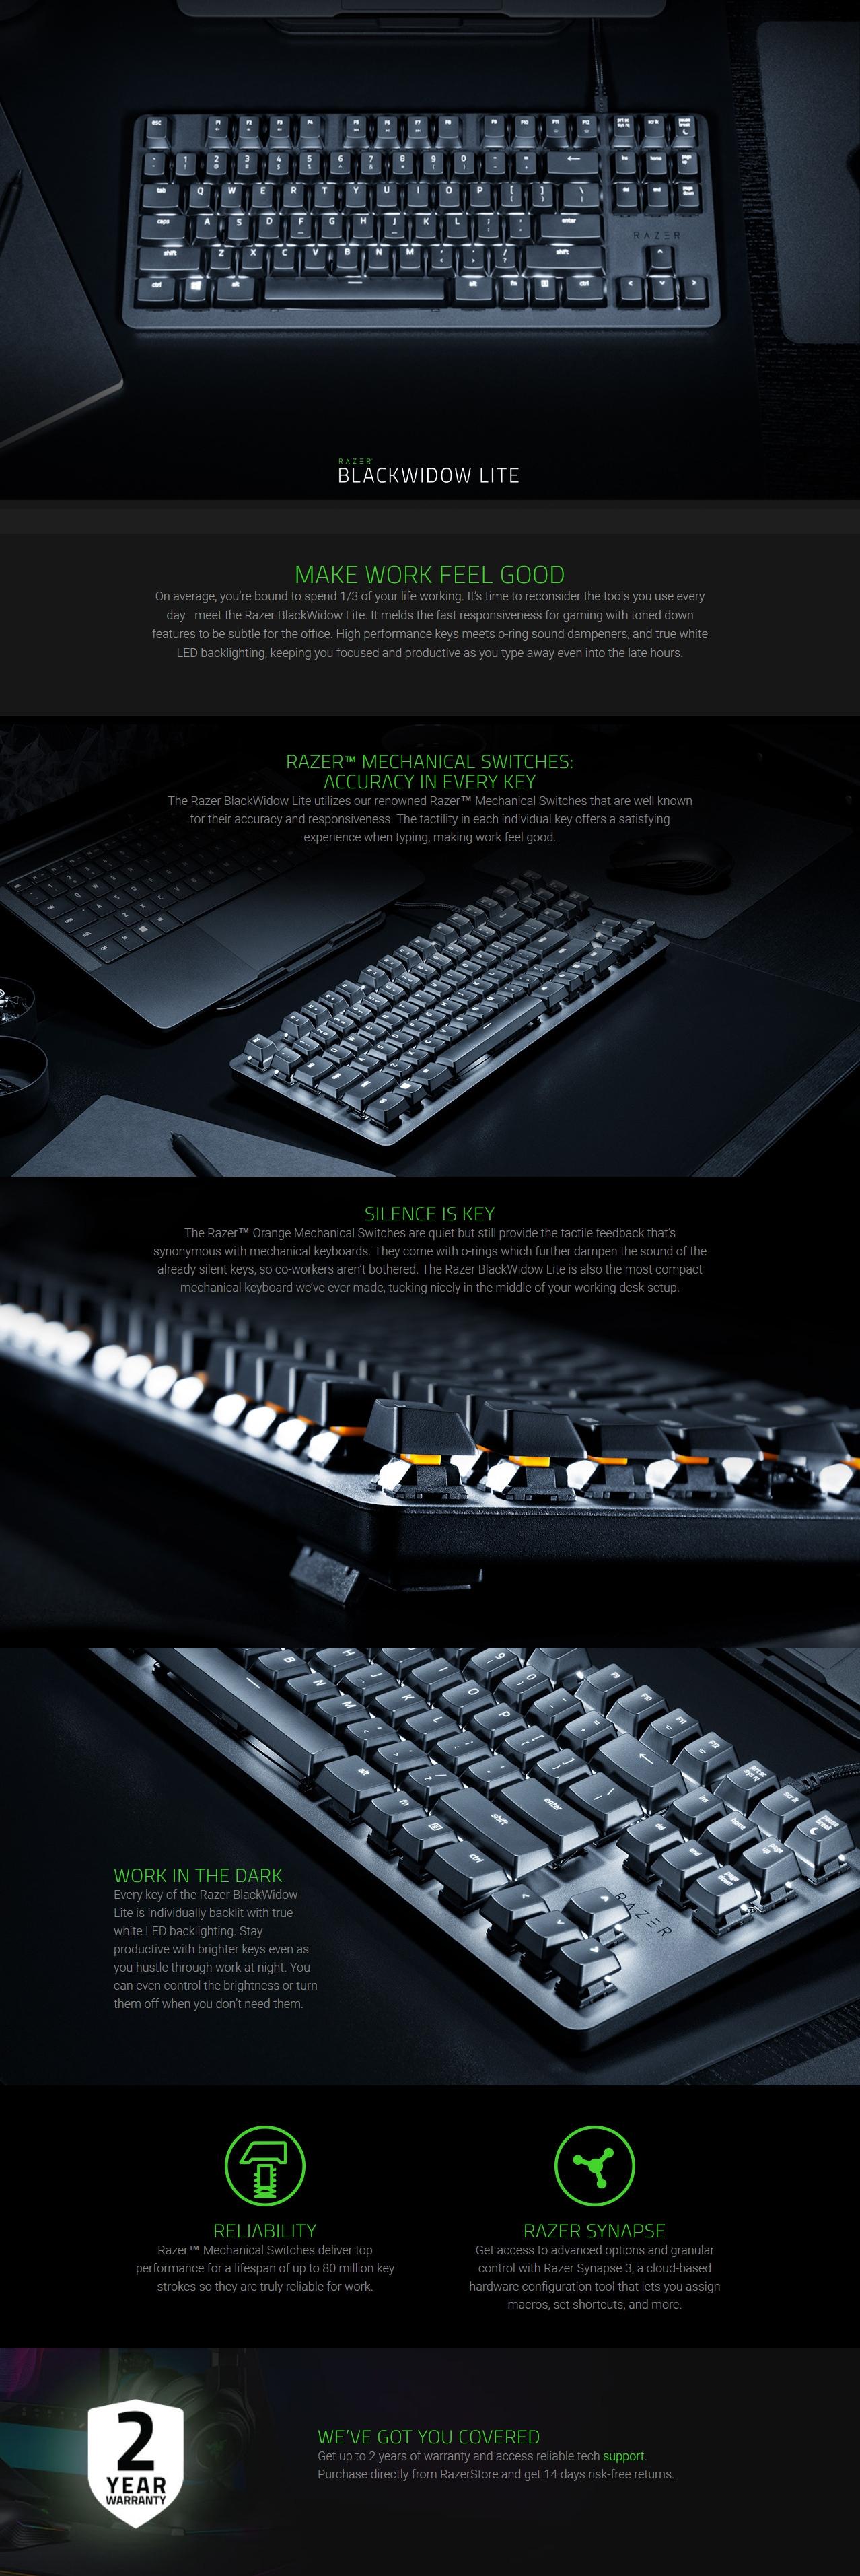 A large marketing image providing additional information about the product Razer Blackwidow Lite Mechanical Gaming Keyboard (Orange Switch) - Additional alt info not provided